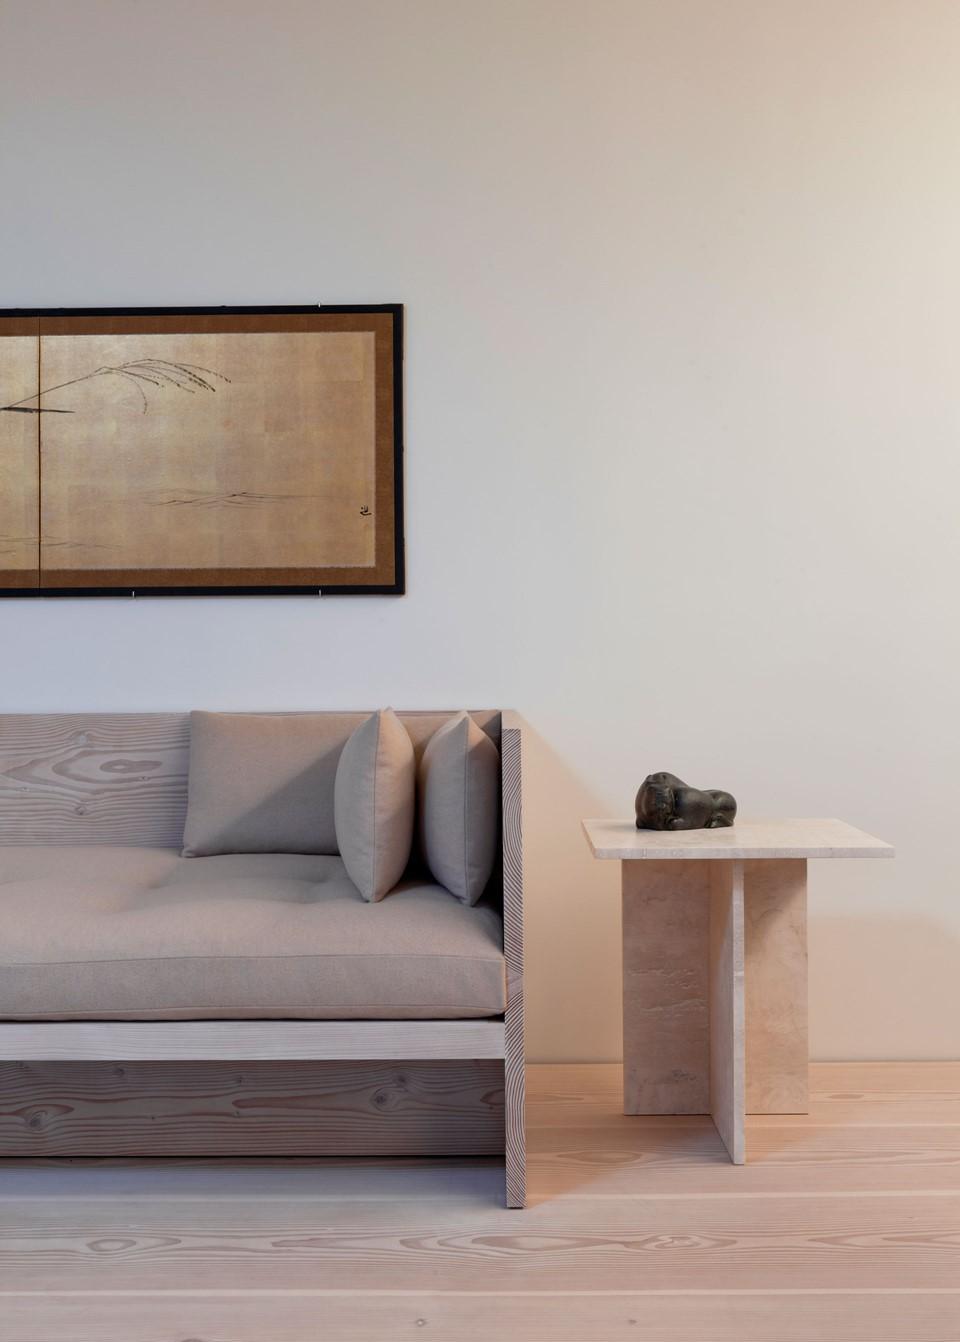 douglas-flooring_lye-and-white-soap_central-park-office_wooden-furniture_dinesen.jpg